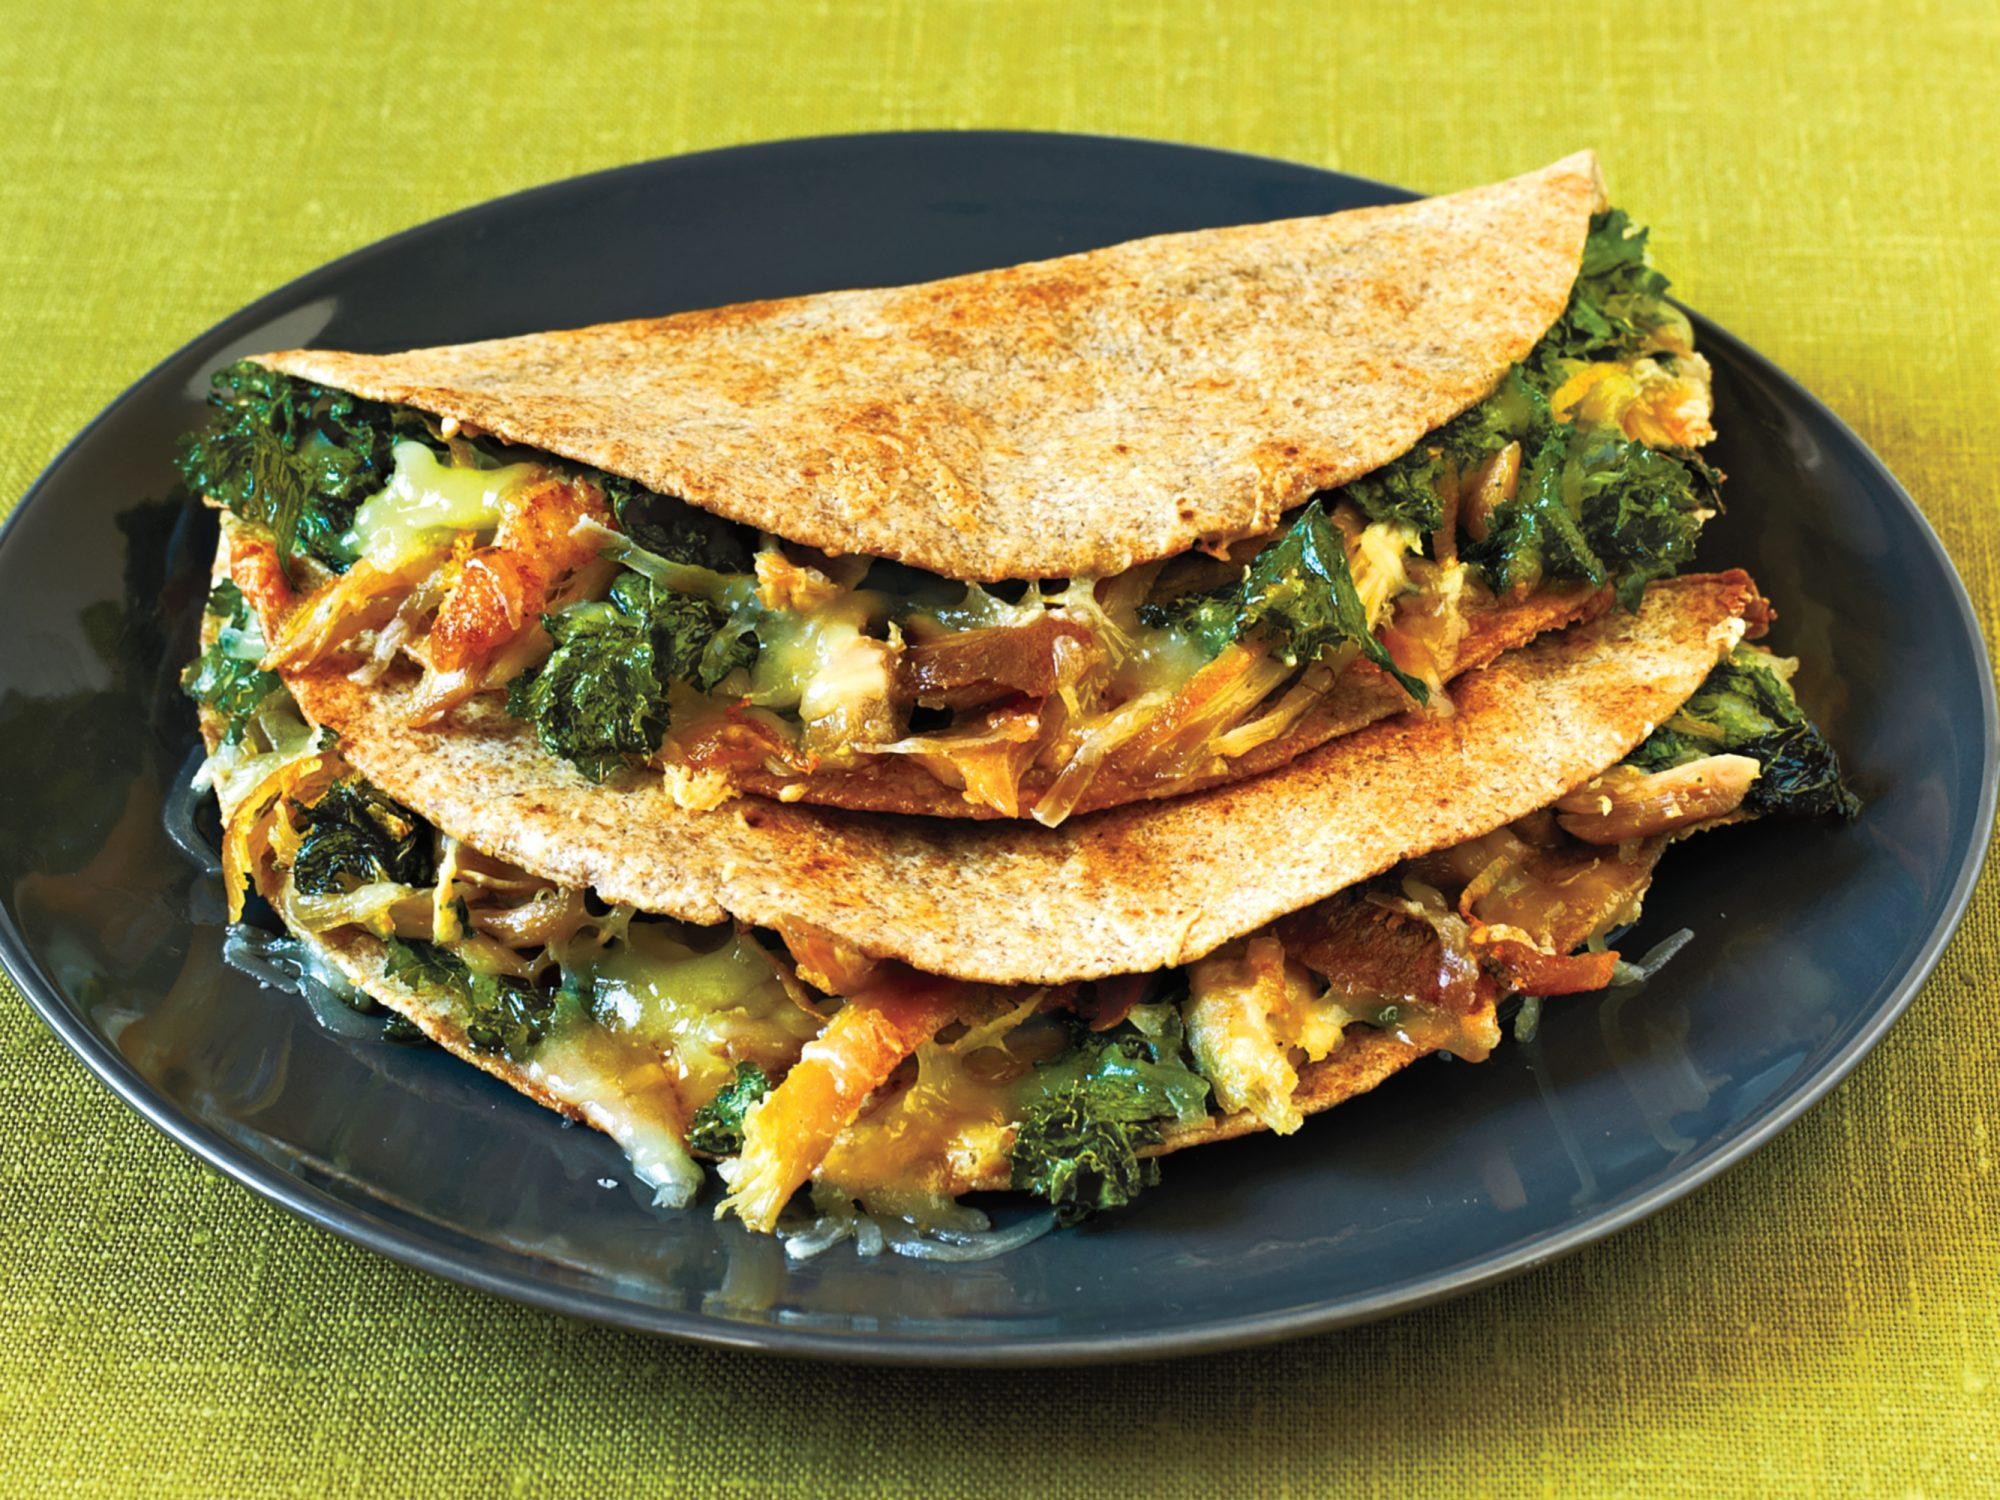 Chicken, Mustard Greens, and Gruyere Quesadillas